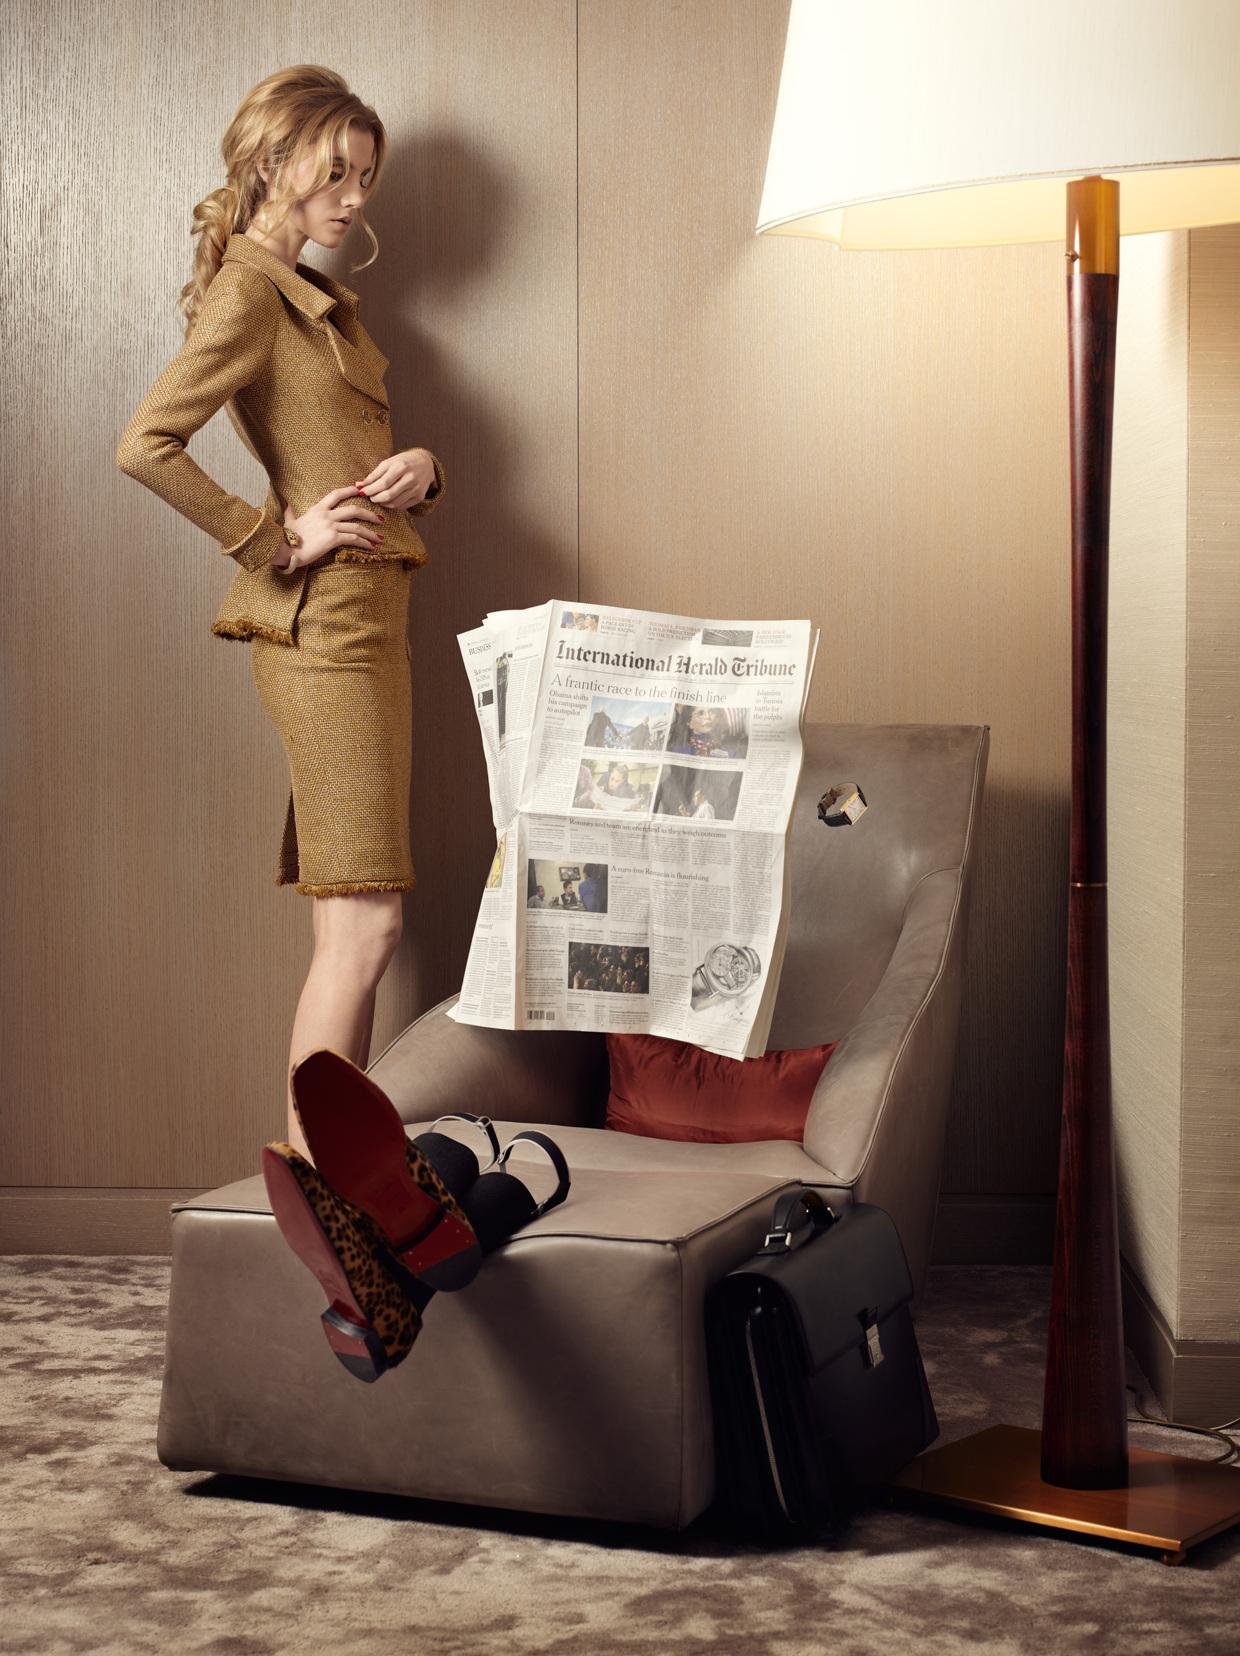 behance-photographers-sasha-goldberger